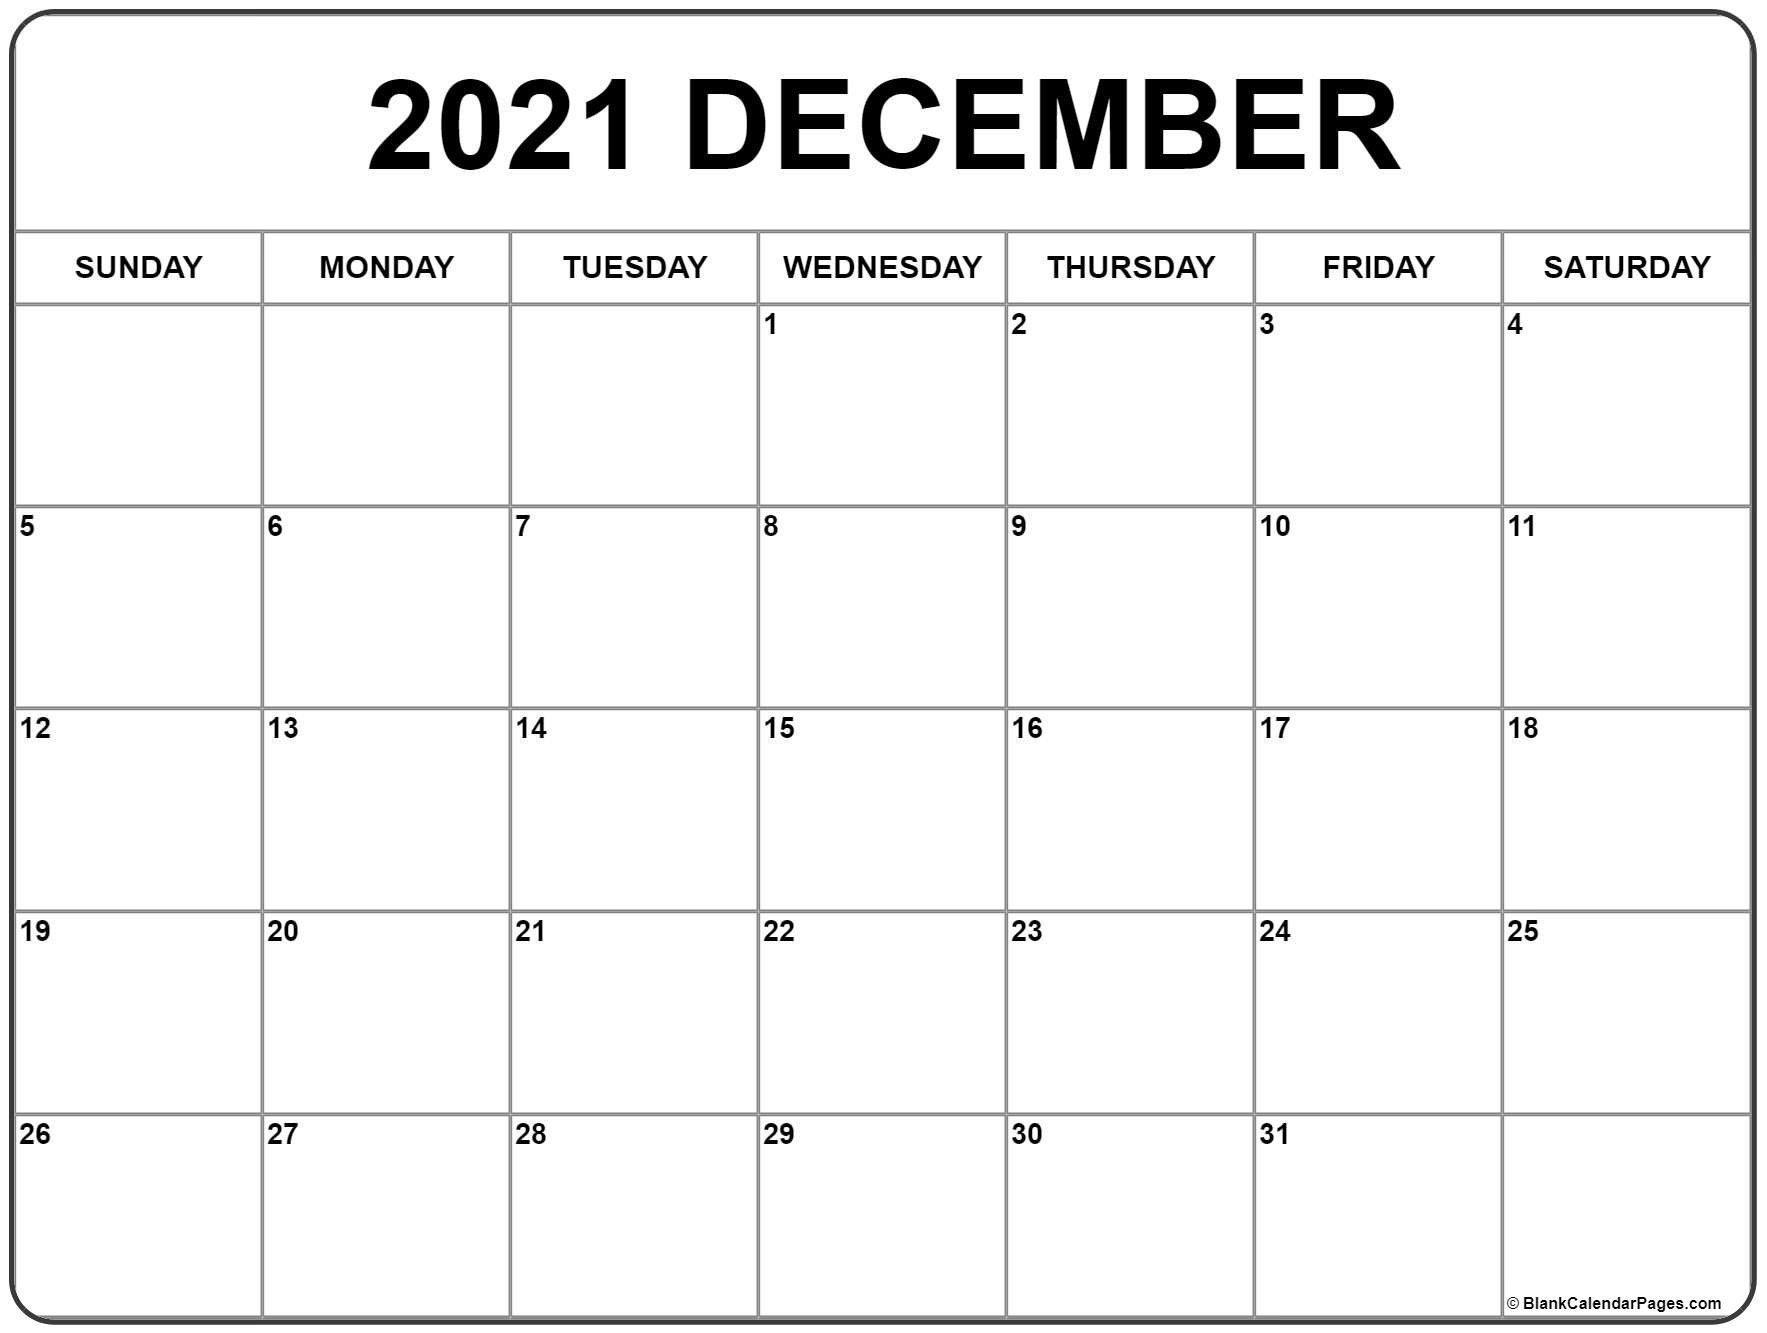 Cute December 2021 Calendar In 2020 | Monthly Calendar